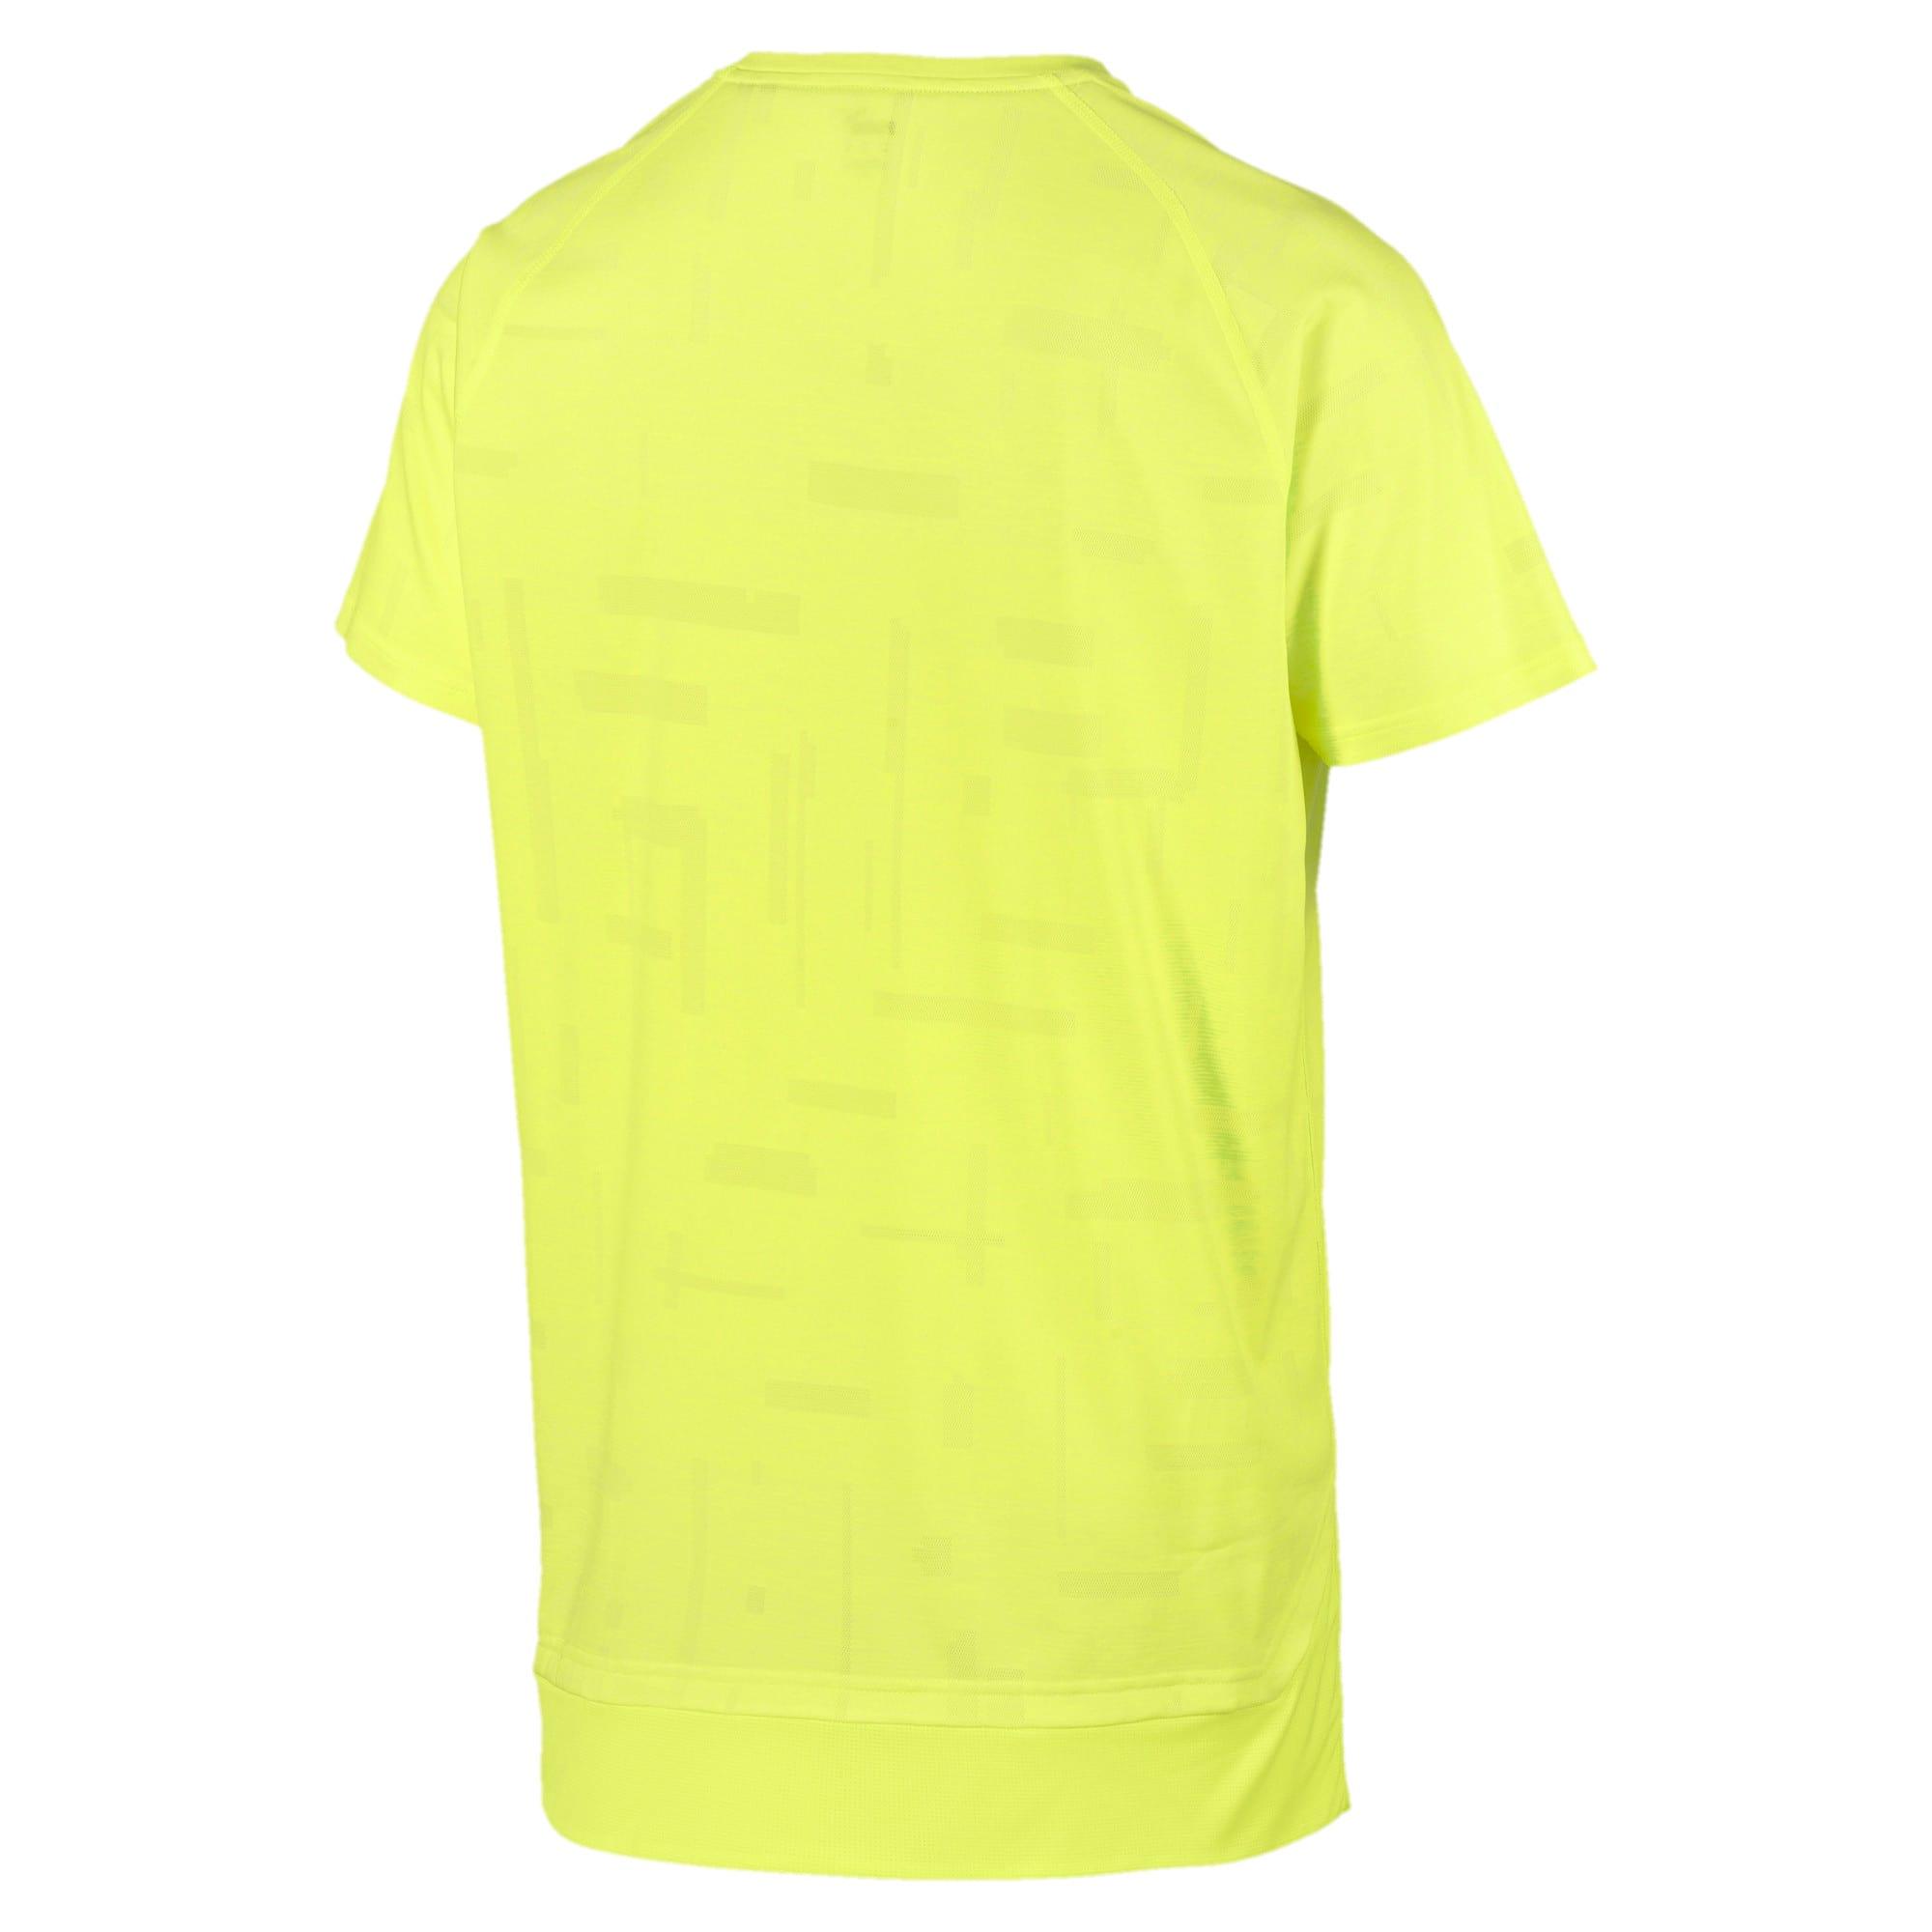 Thumbnail 5 of Energy Short Sleeve Tech Men's Training Tee, Fizzy Yellow, medium